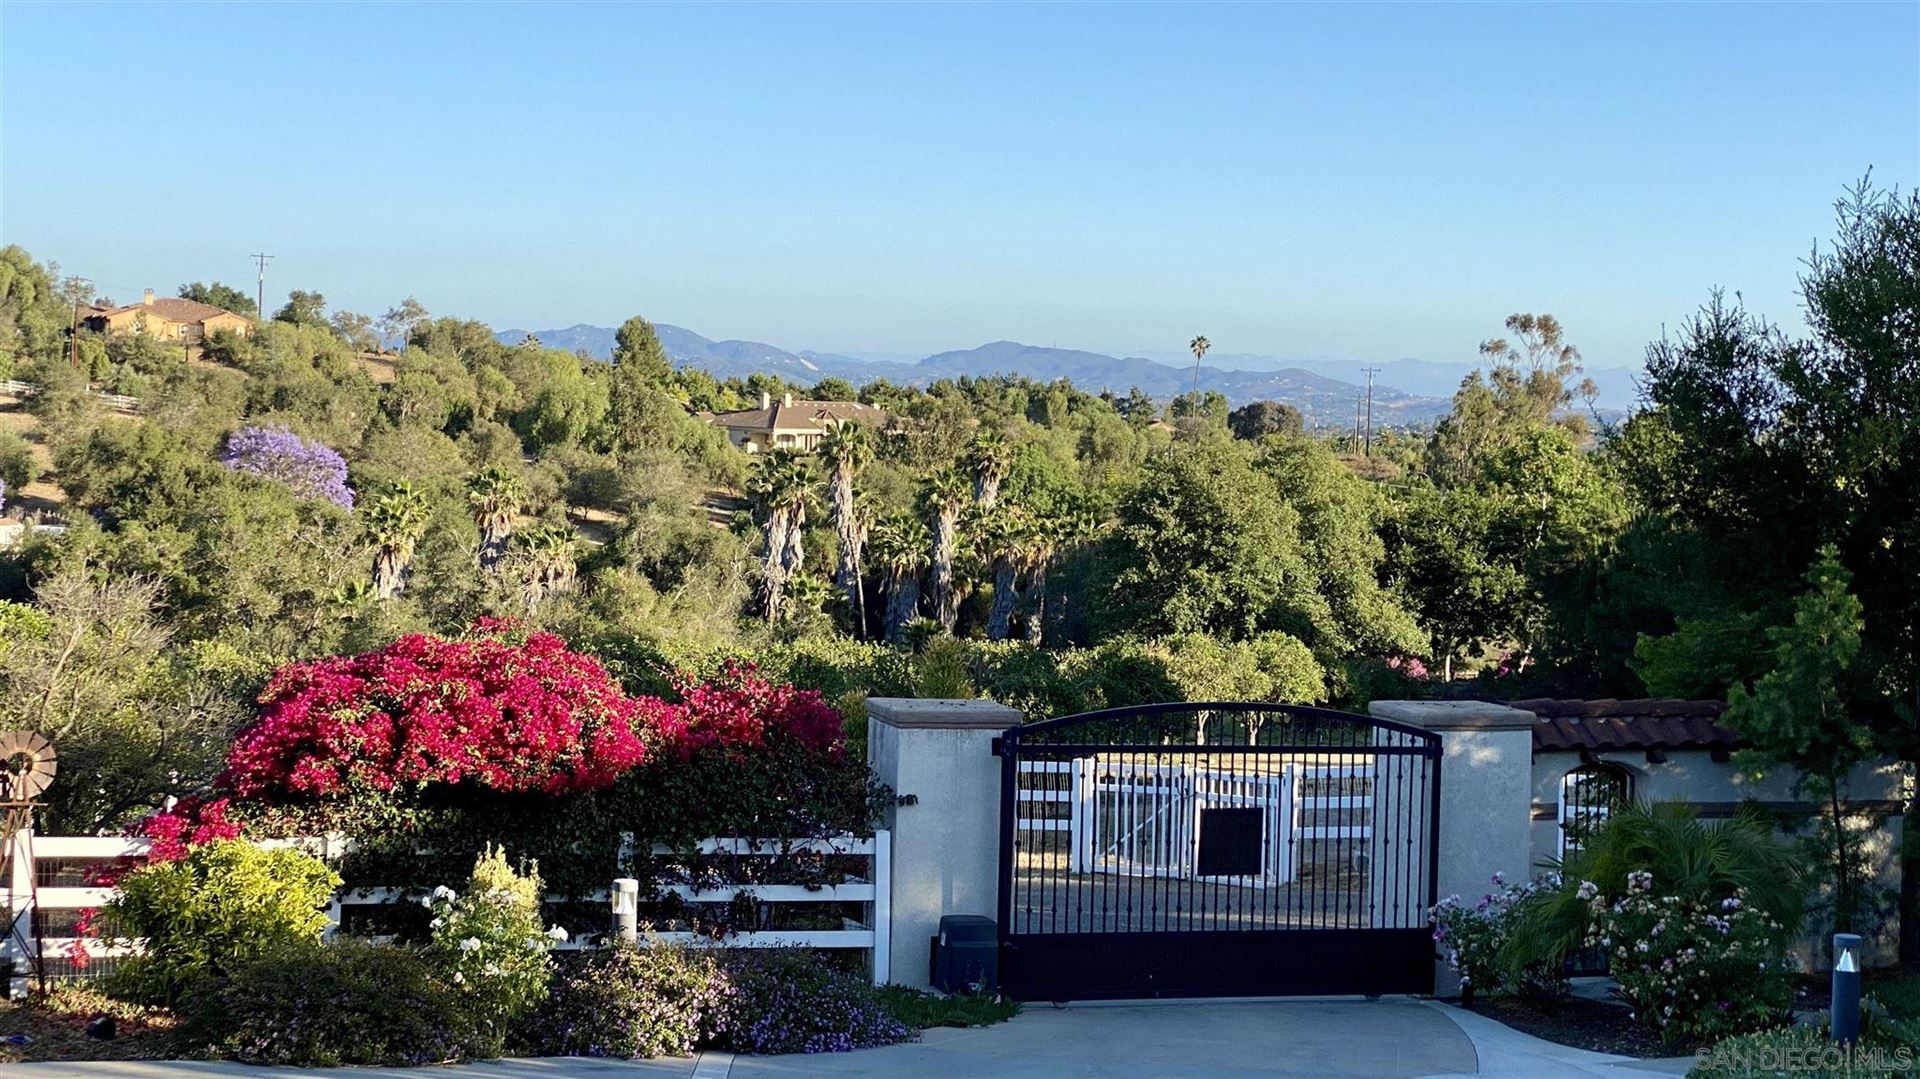 Photo of 3196 Los Alisos Drive, Fallbrook, CA 92028 (MLS # 210018759)